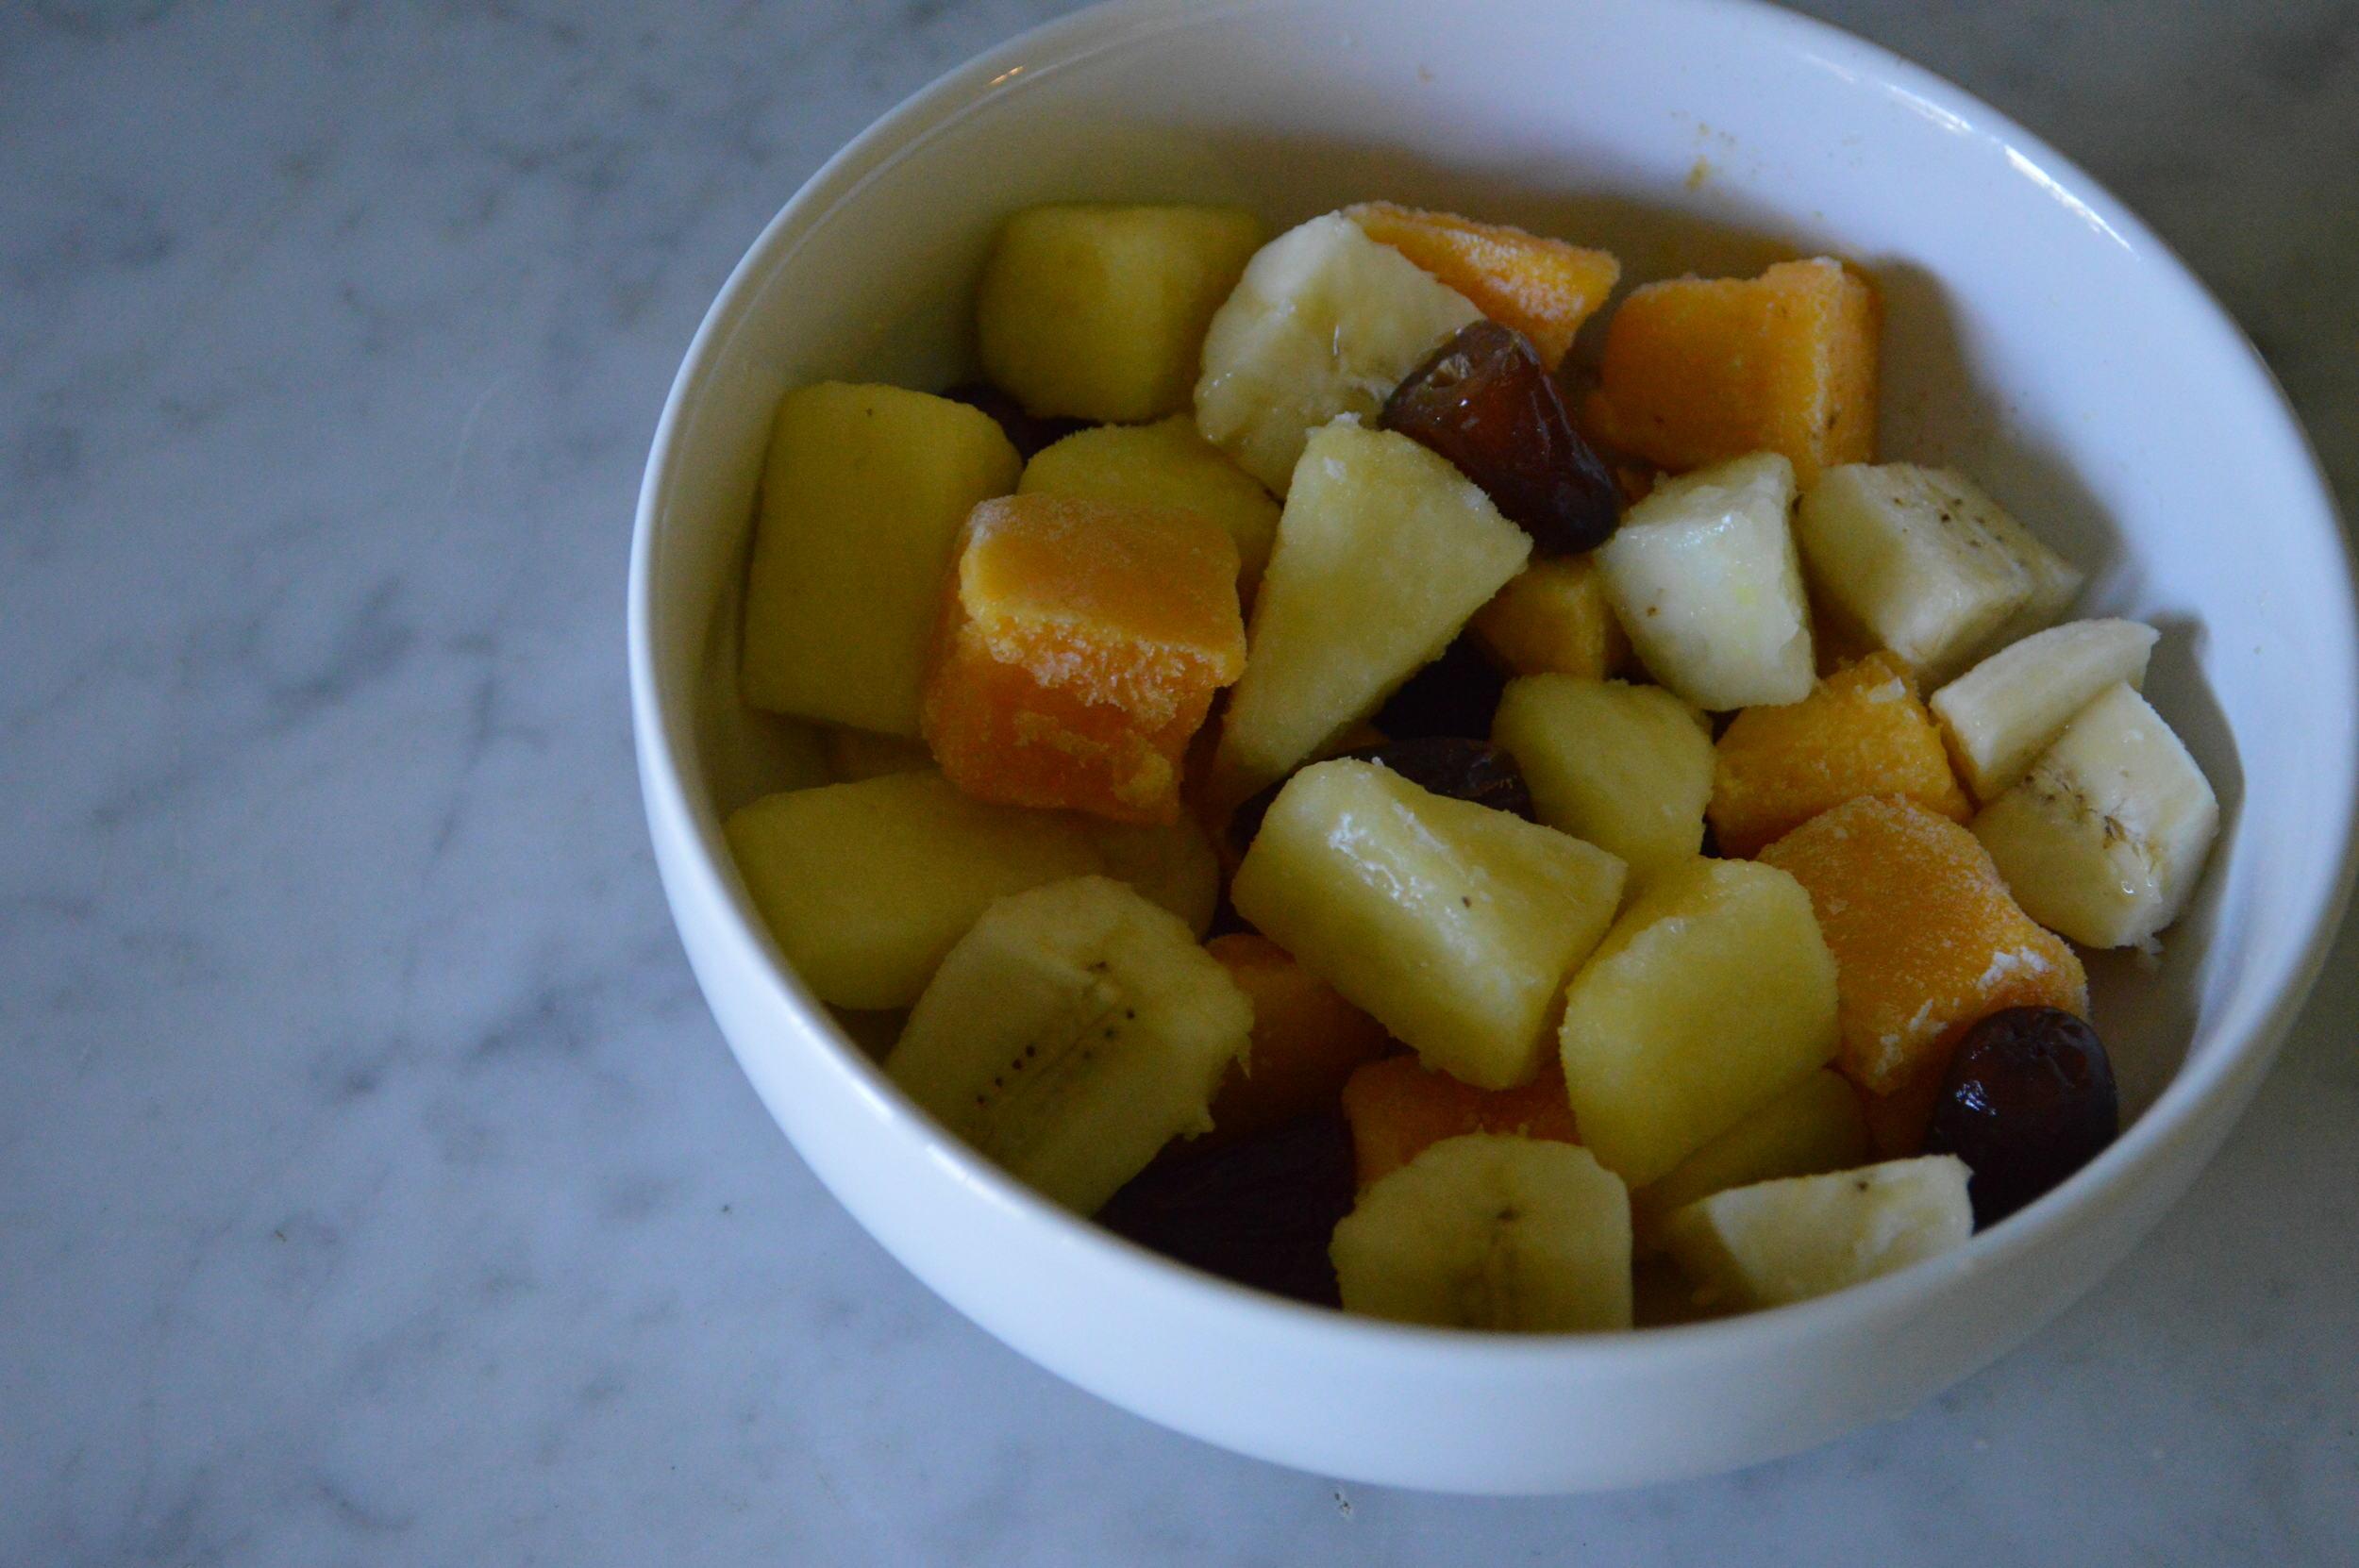 banana, mango, pineapple & dates